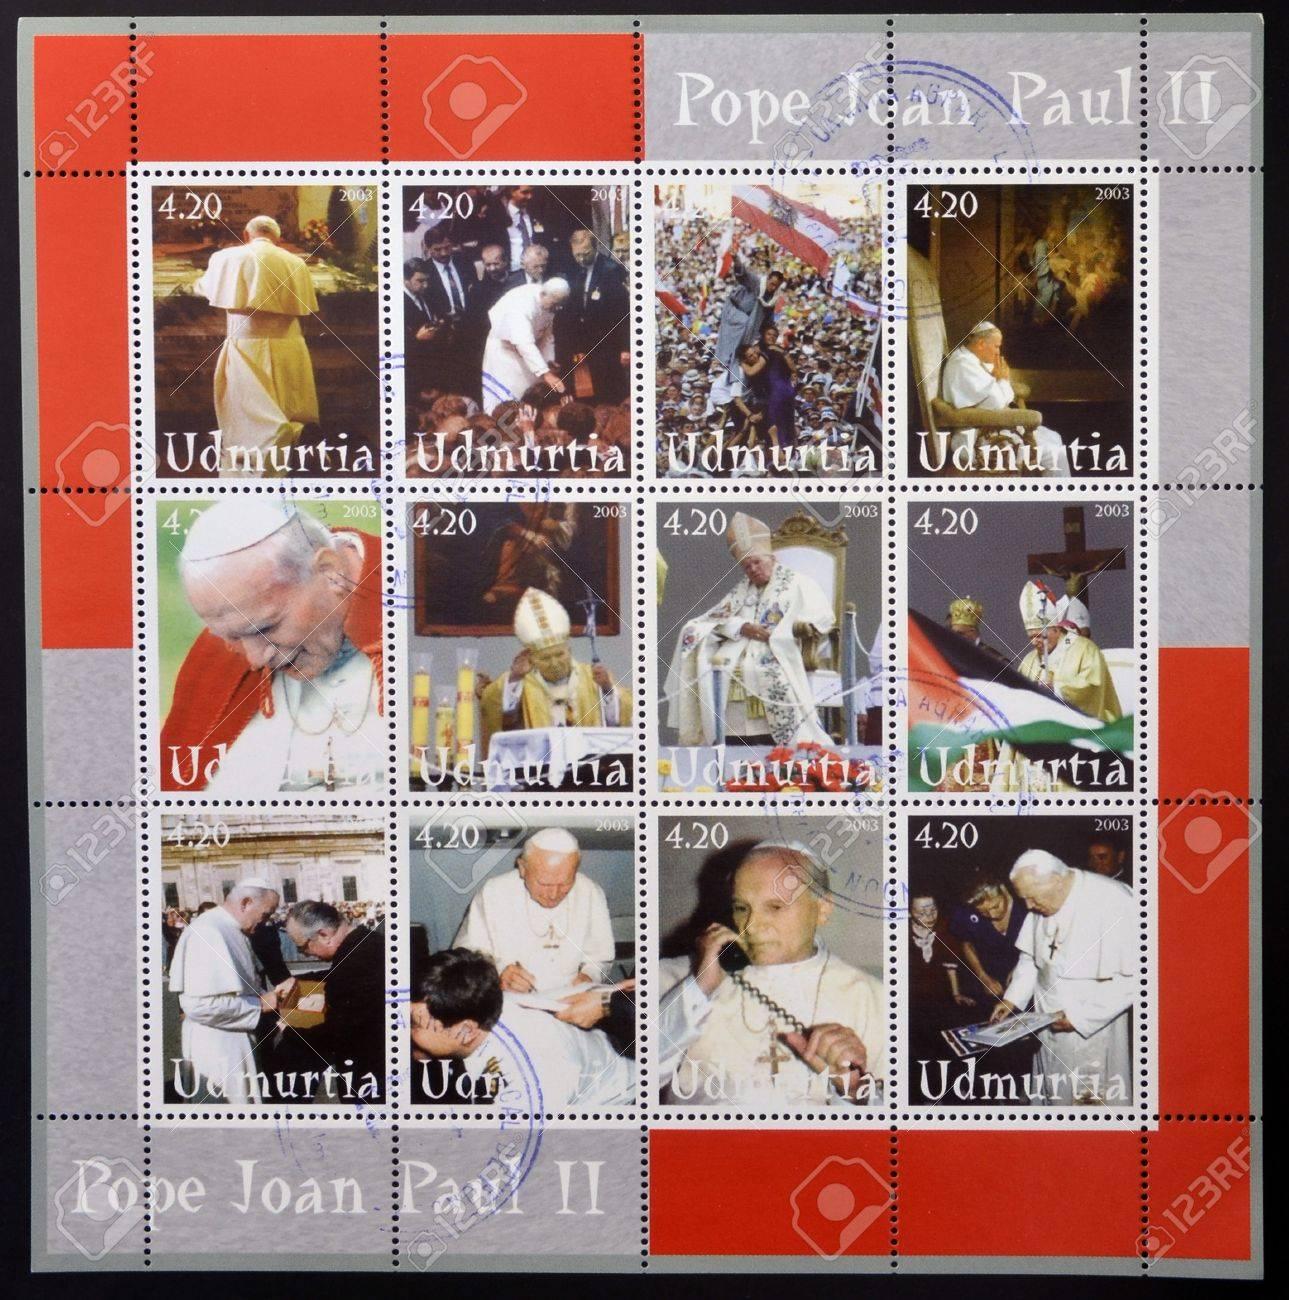 UDMURTIA - CIRCA 2003  Collection stamps printed in Udmurtia shows Pope John Paul II, circa 2003 Stock Photo - 14803330